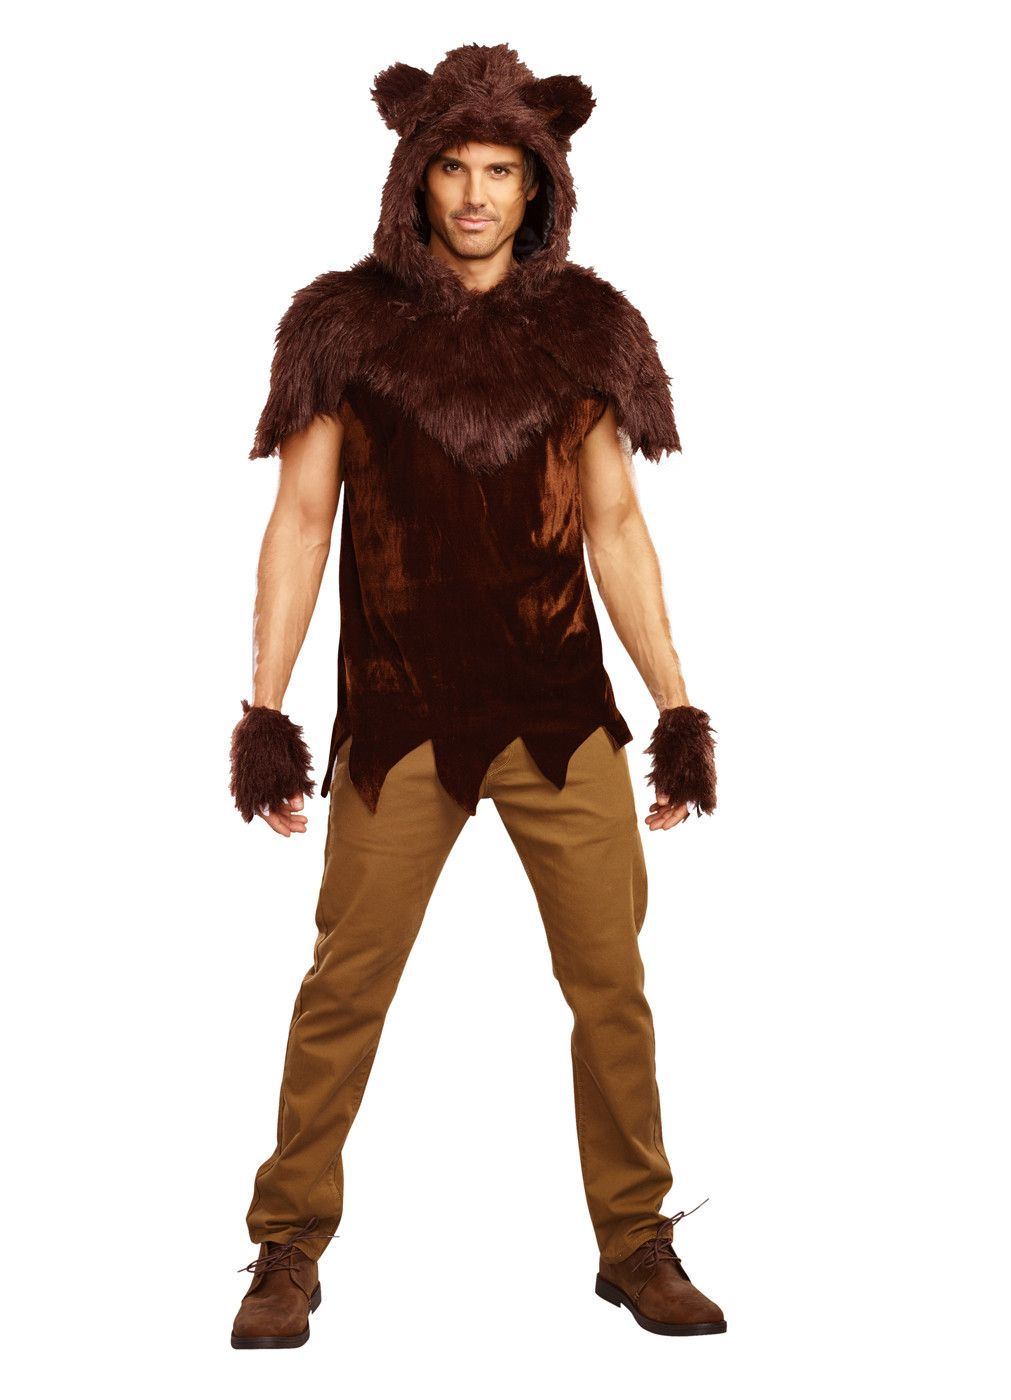 papa bear adult costume in 2018 | costume ideas | pinterest | bear